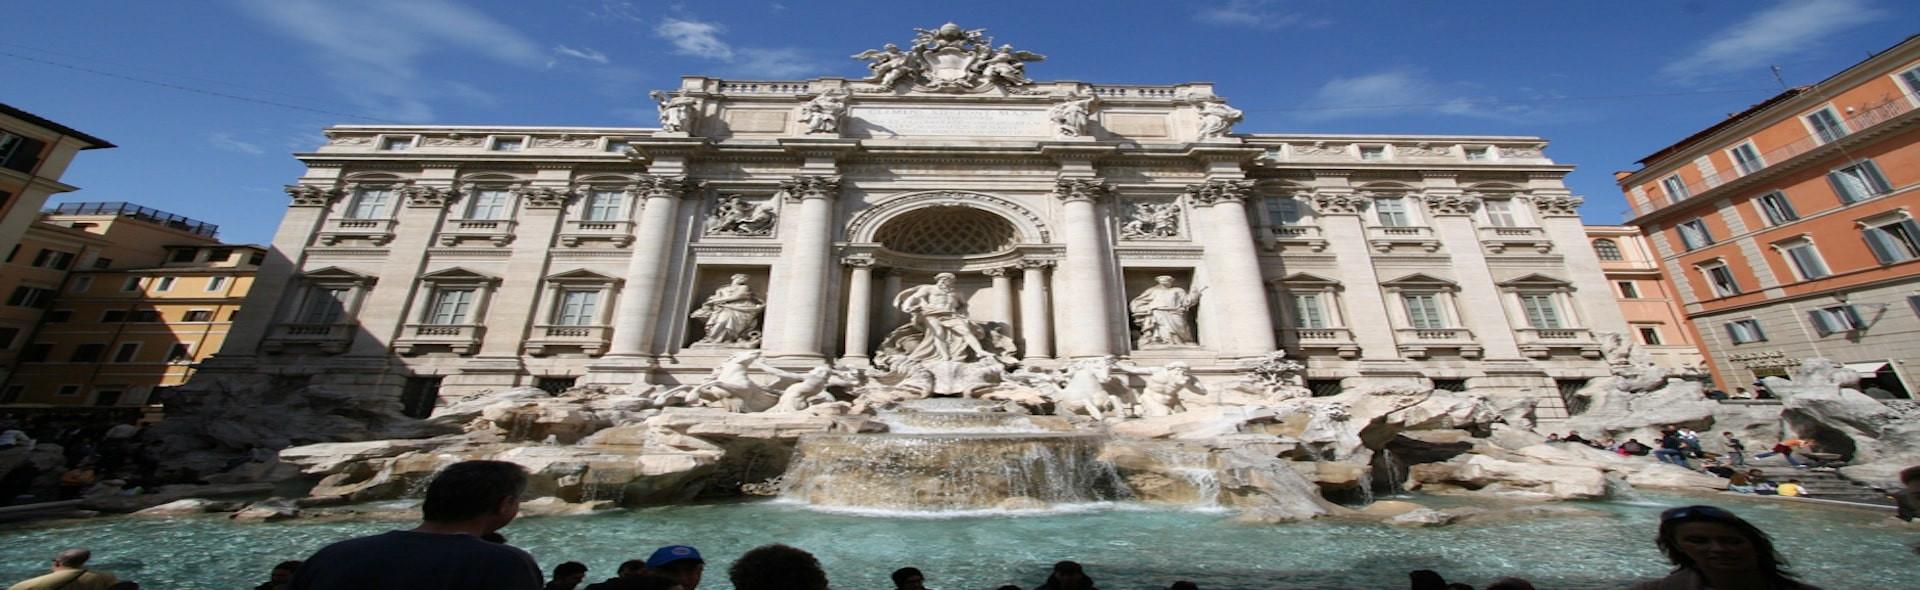 Pellegrinaggio a Roma Week End Maggio